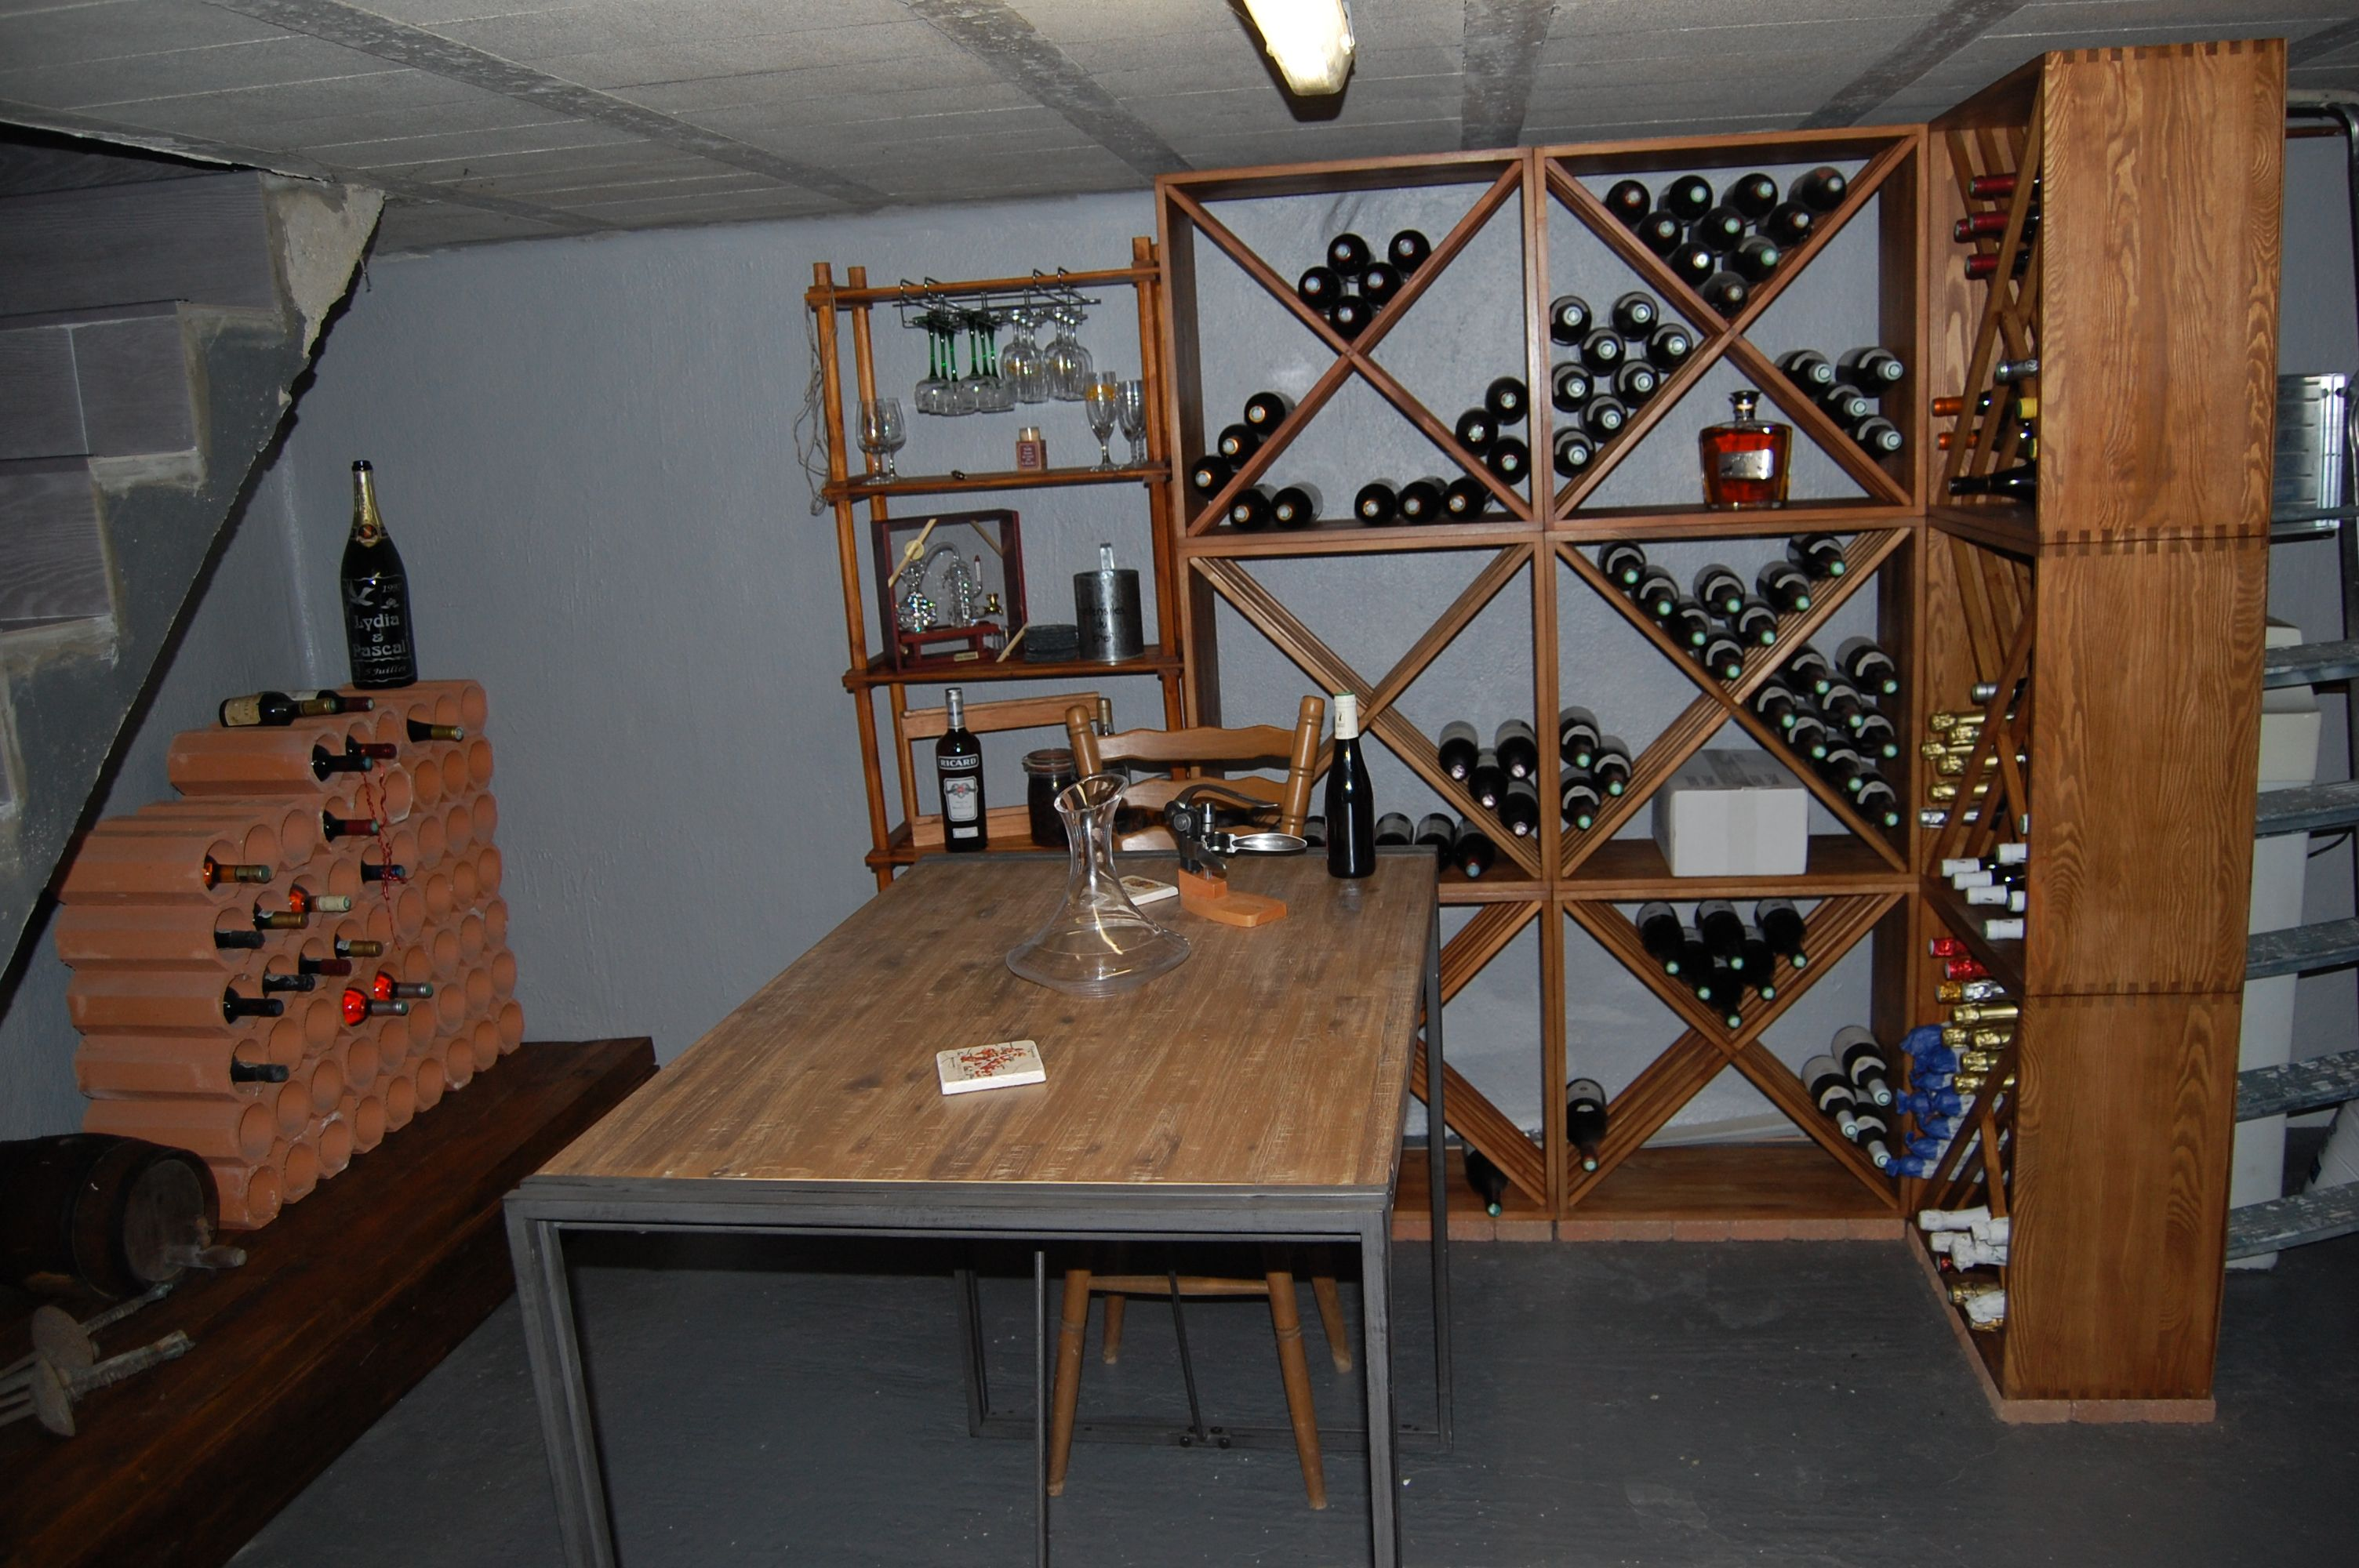 casier bouteilles casier vin rangement du vin am nagement cave casier bois cave. Black Bedroom Furniture Sets. Home Design Ideas